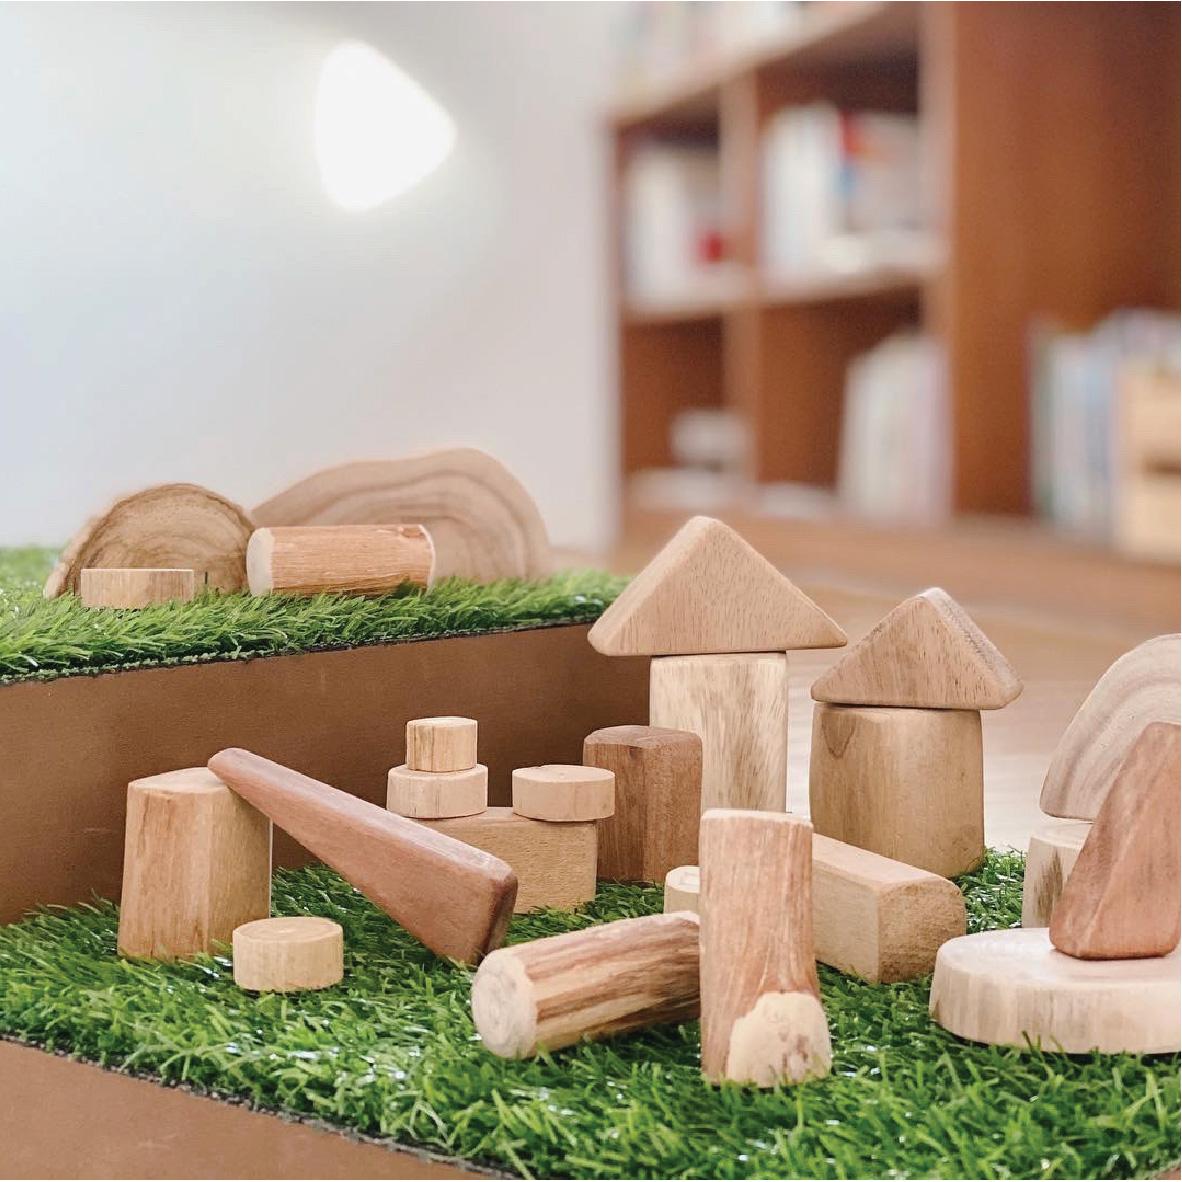 Handmade Blocks